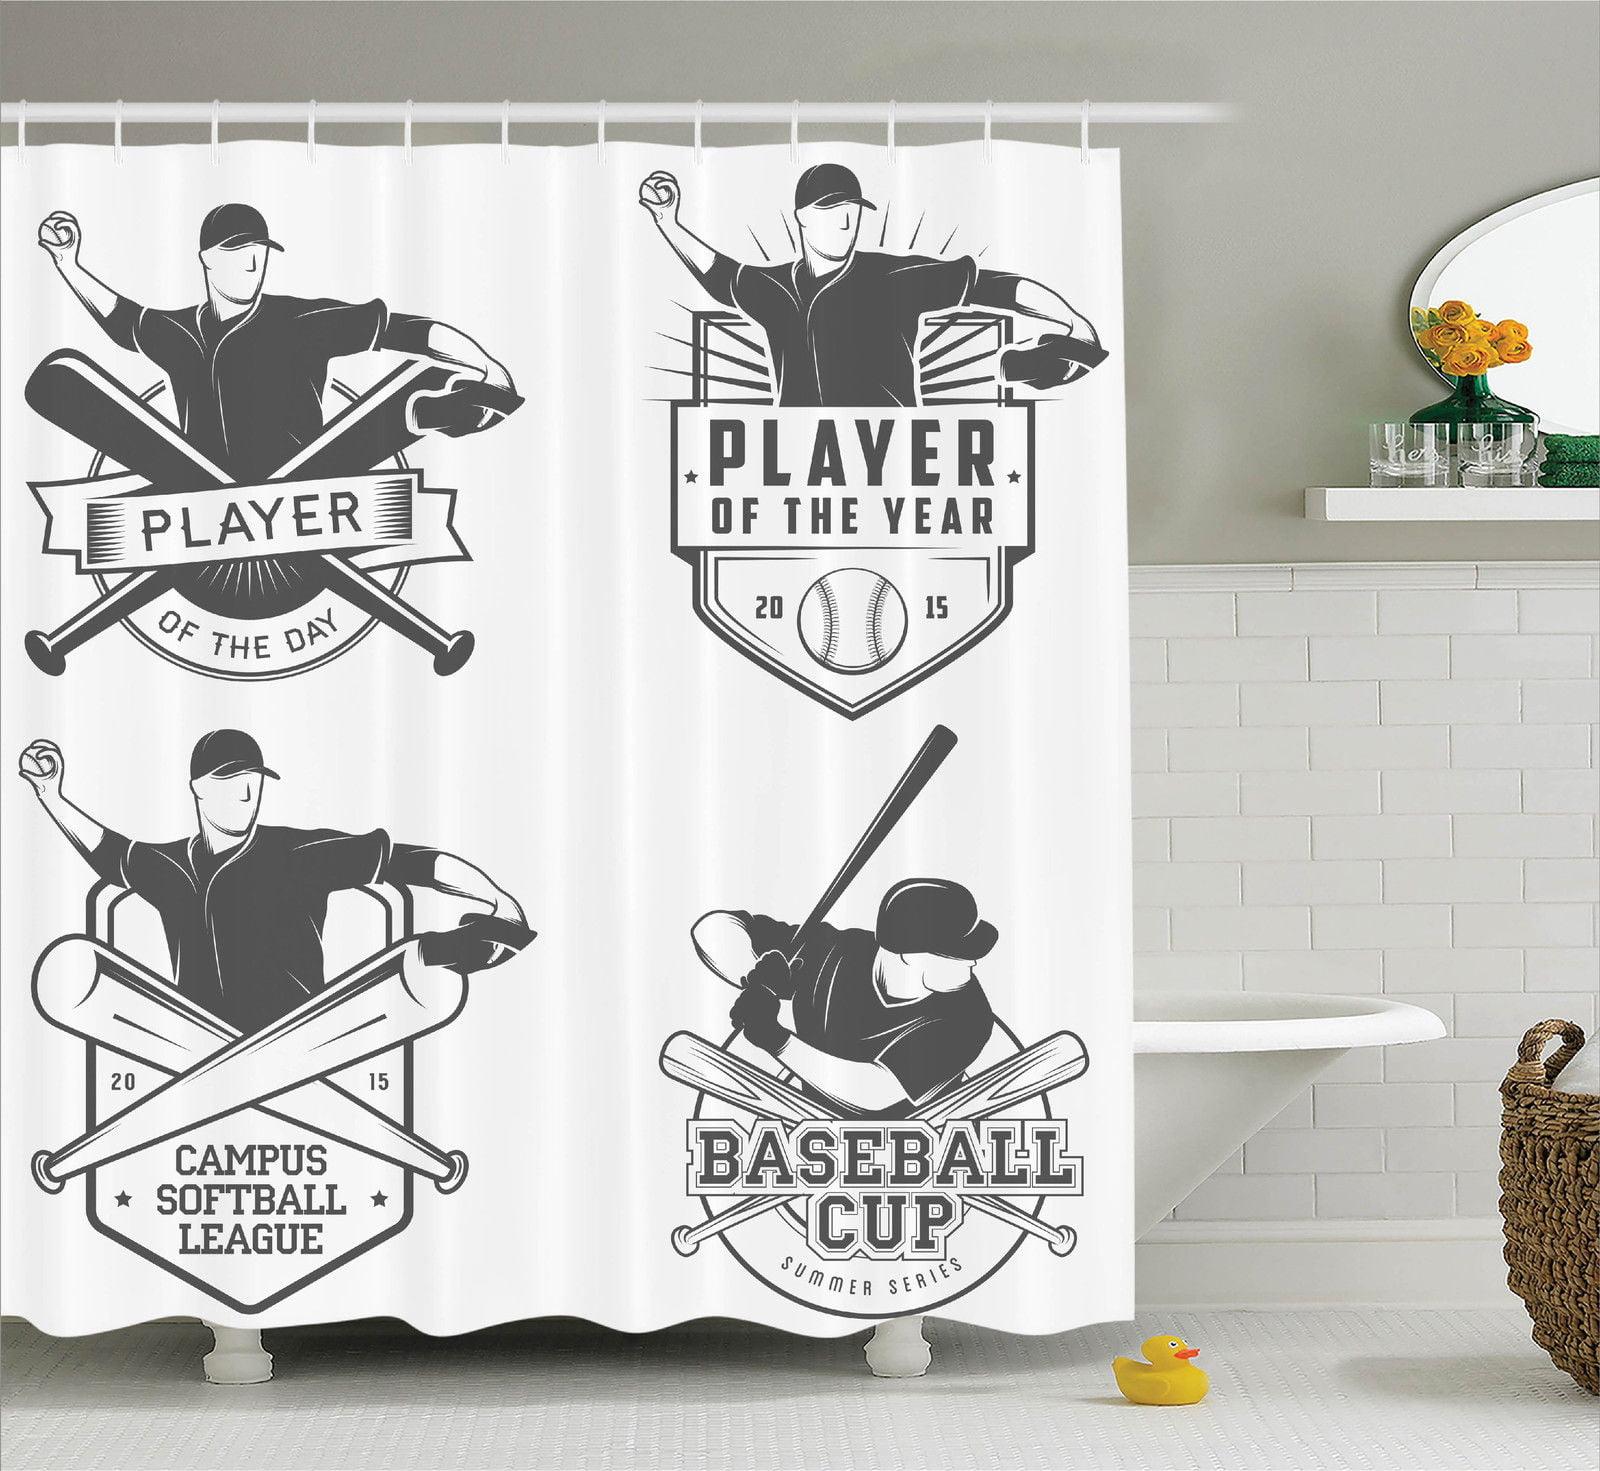 sports decor shower curtain set, vintage baseball and softball